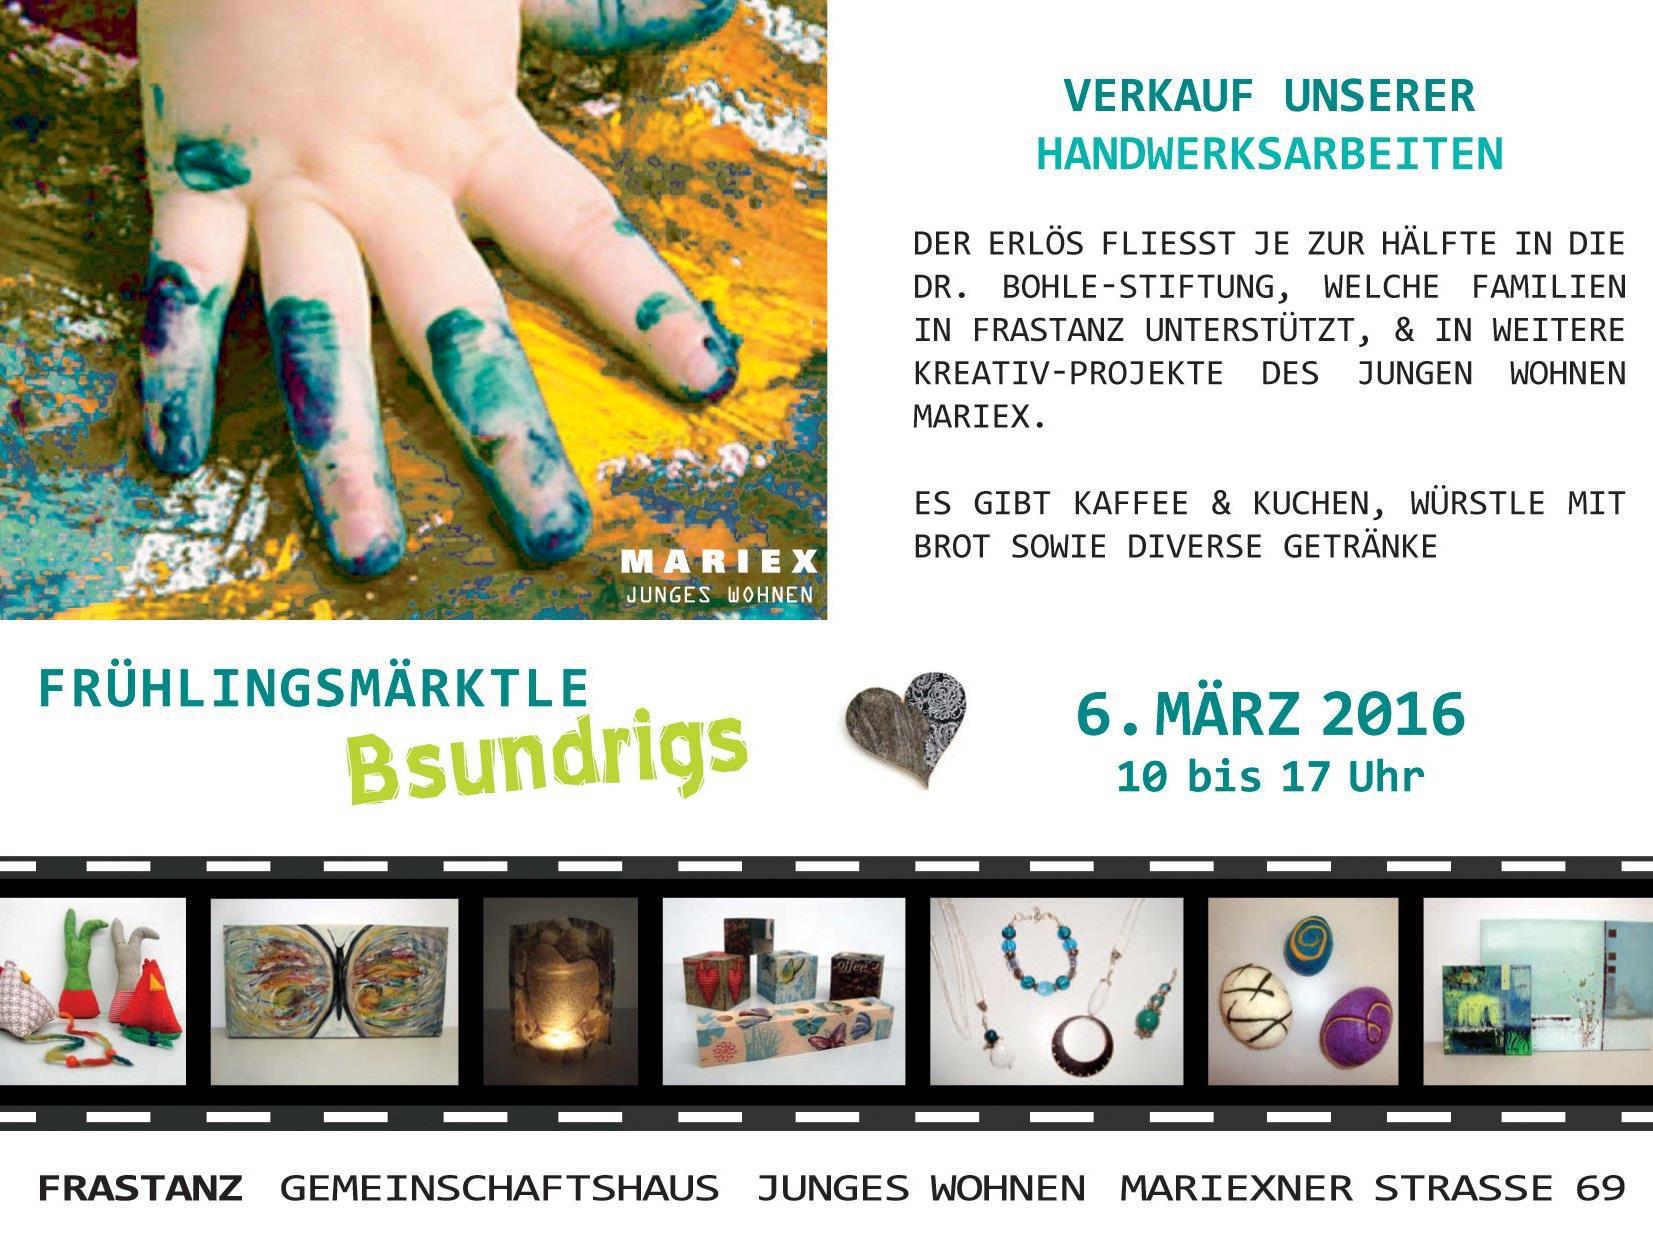 "Verkaufsmärktle ""Bsundrigs"" im Jungen Wohnen Mariex"